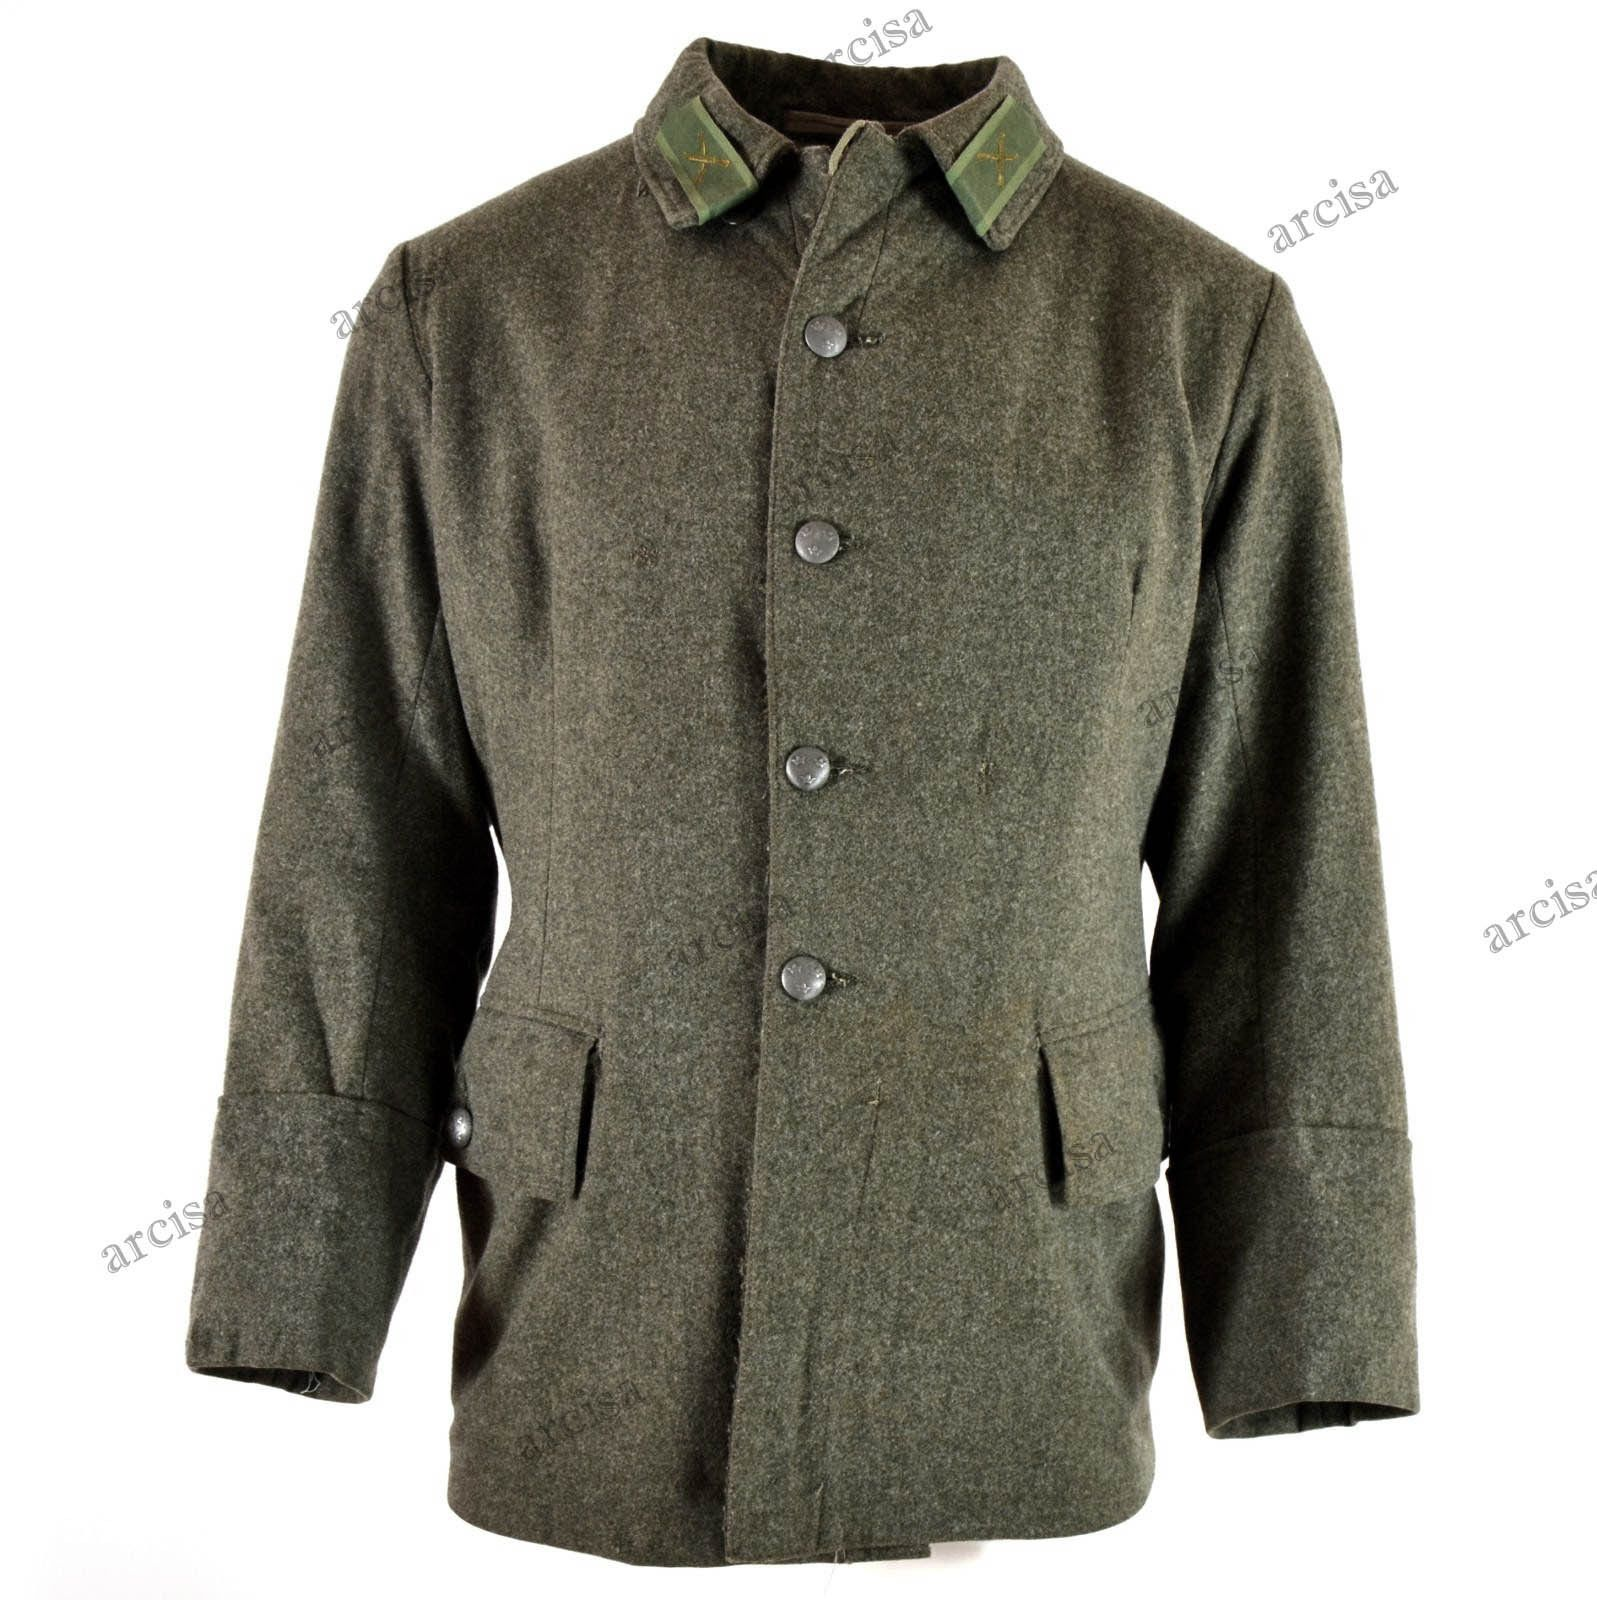 3327fee3d7 WWII original vintage Swedish army wool uniform jacket M39 1940 s uniform